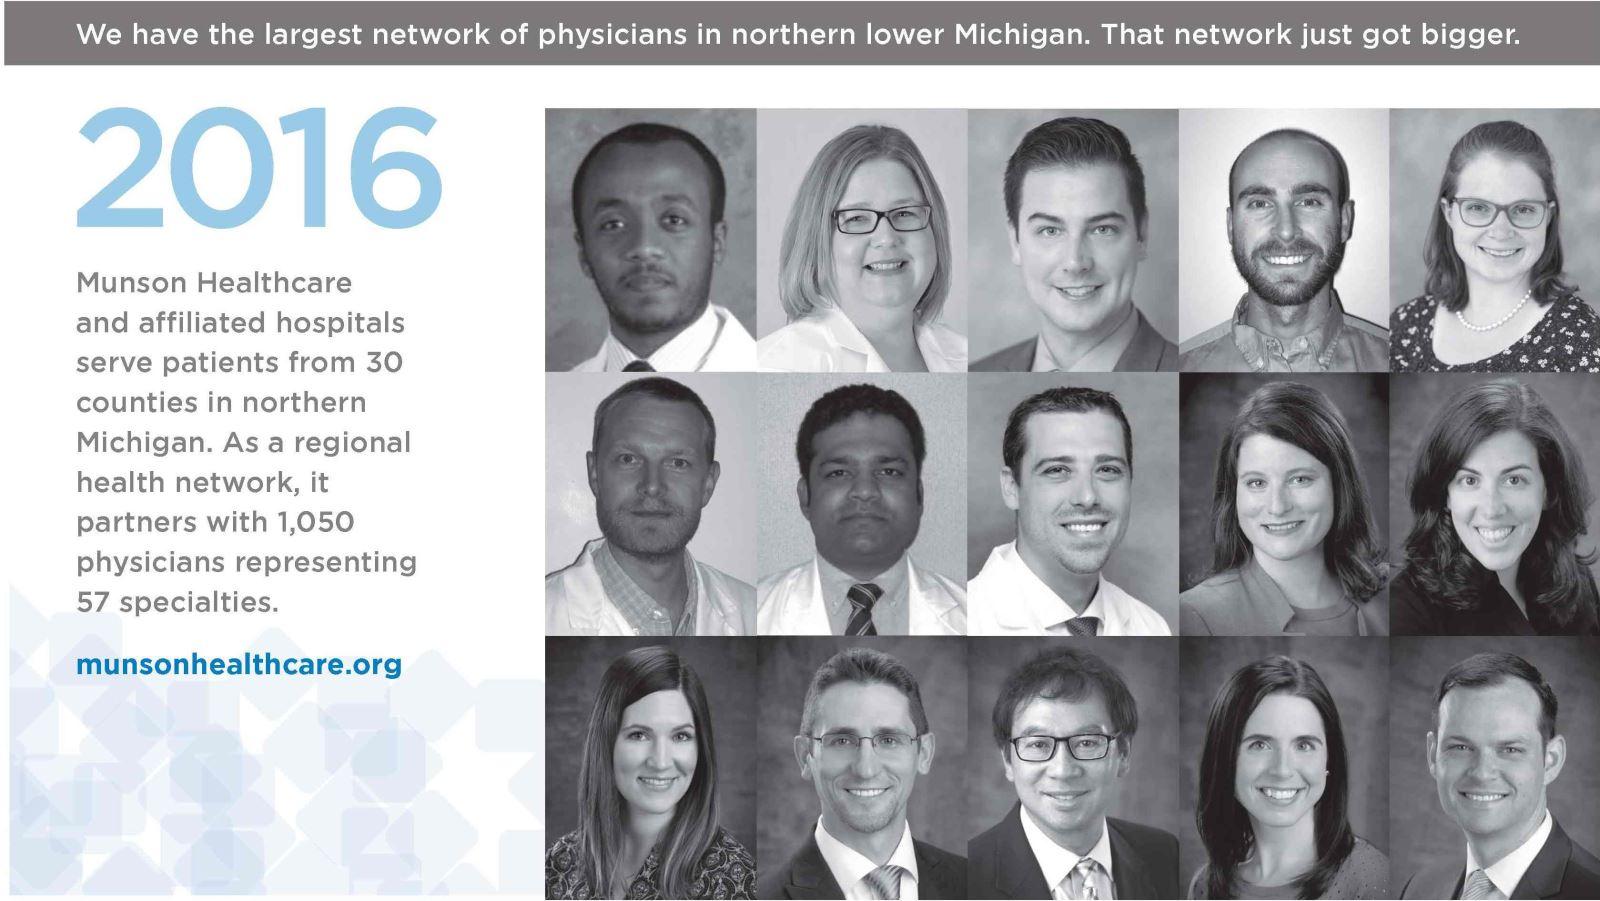 Munson Healthcare New Physicians   Munson Healthcare